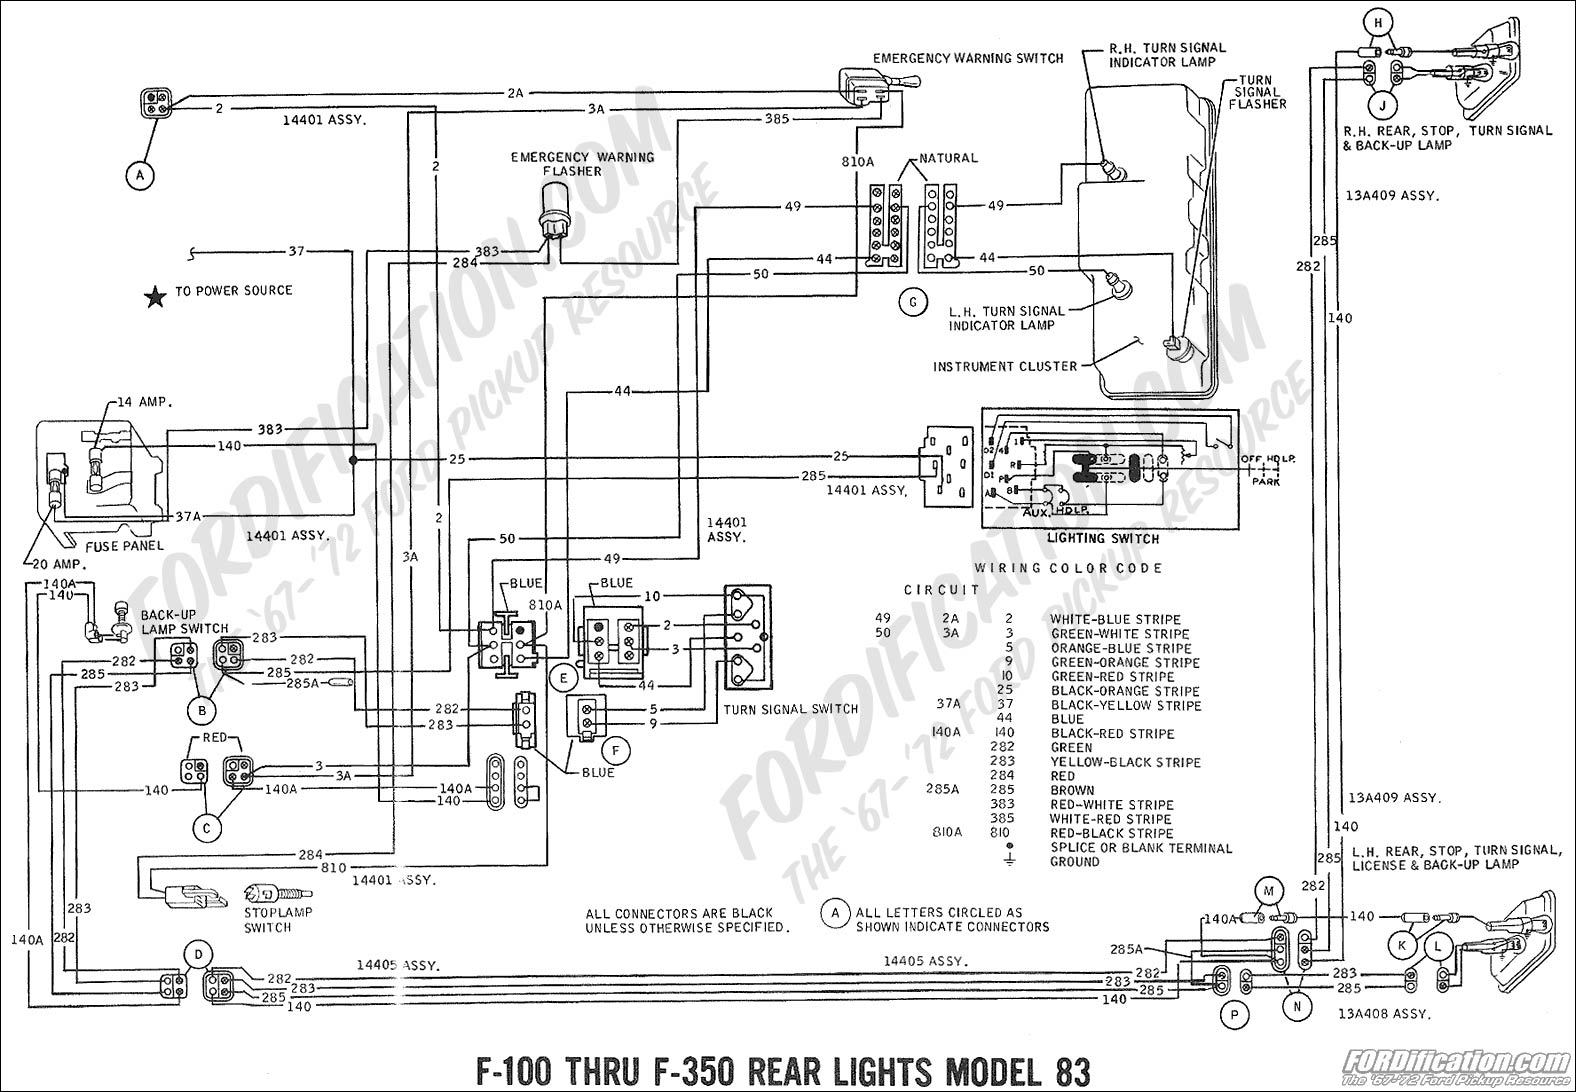 delorean distributor wiring diagram